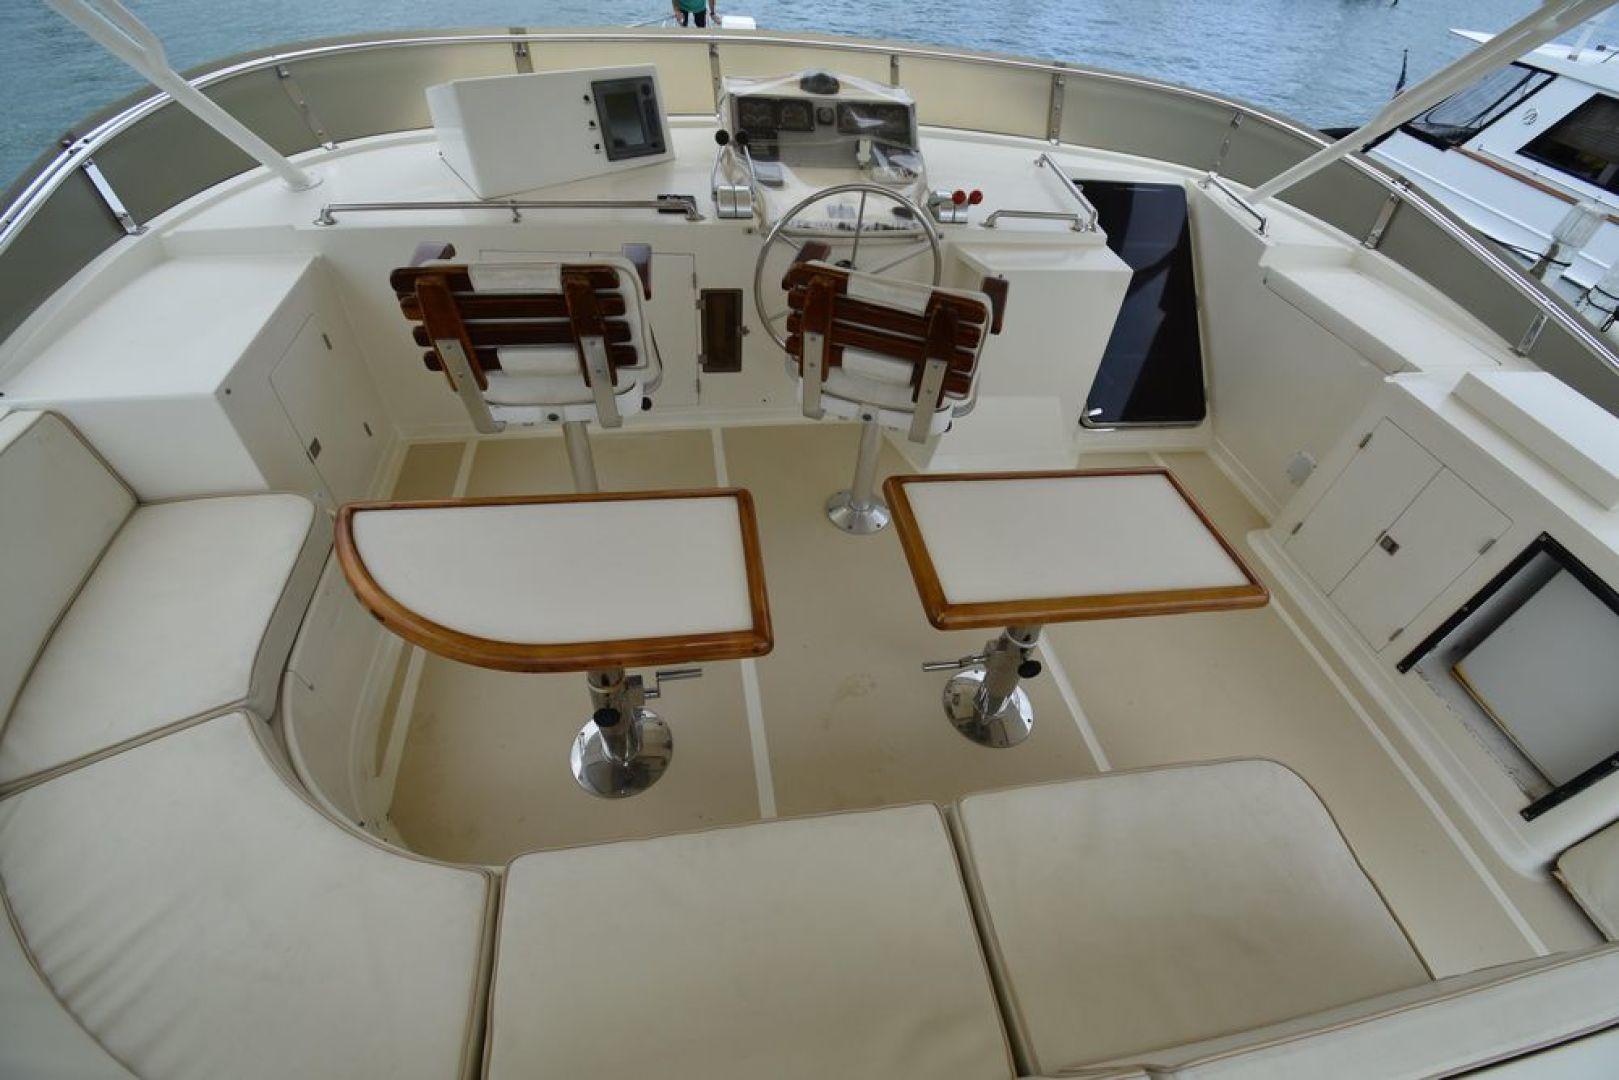 Offshore Yachts-Pilot House 2000-Six C One II Nassau-Bahamas-1275726 | Thumbnail